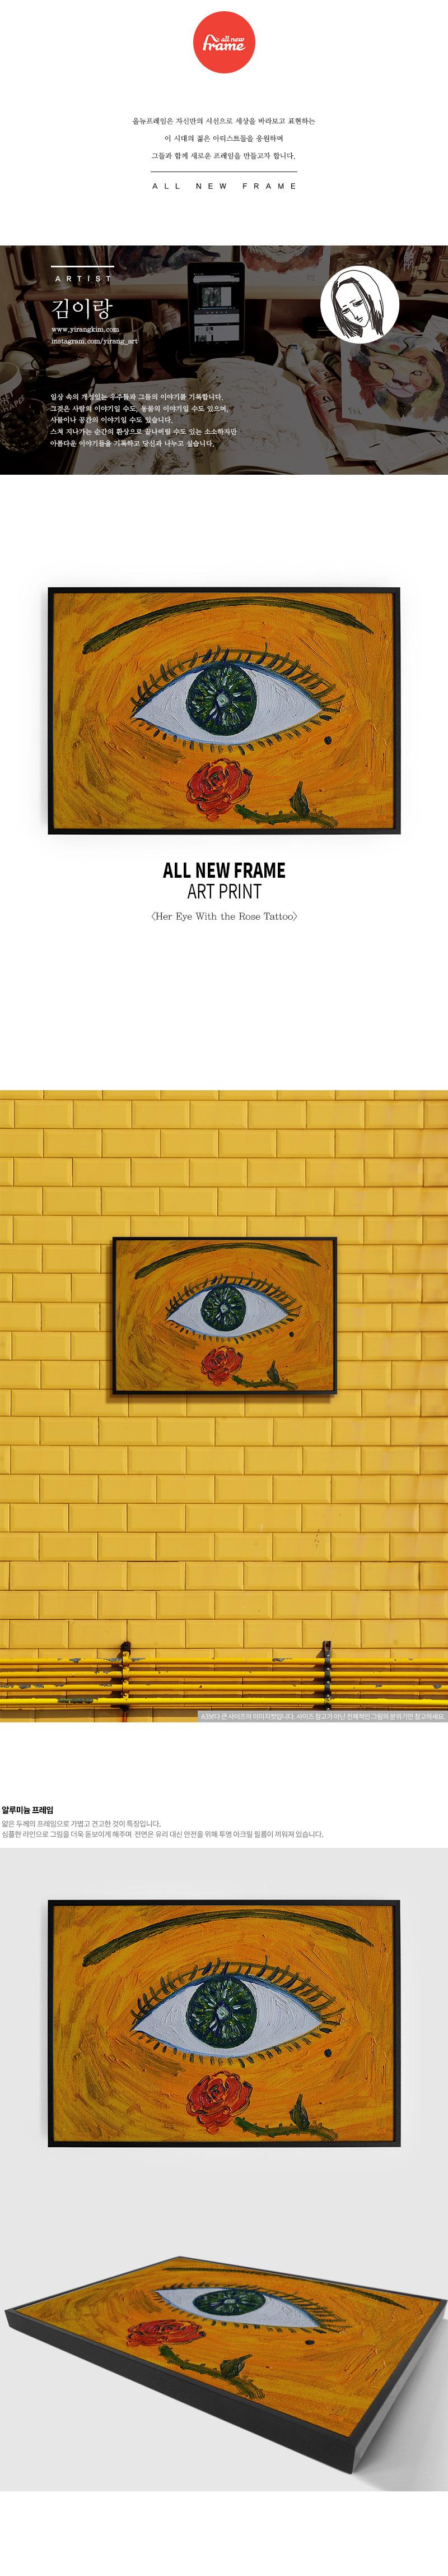 Her Eye With the Rose Tattoo- 일러스트 액자 - 올뉴프레임, 55,000원, 홈갤러리, 캔버스아트